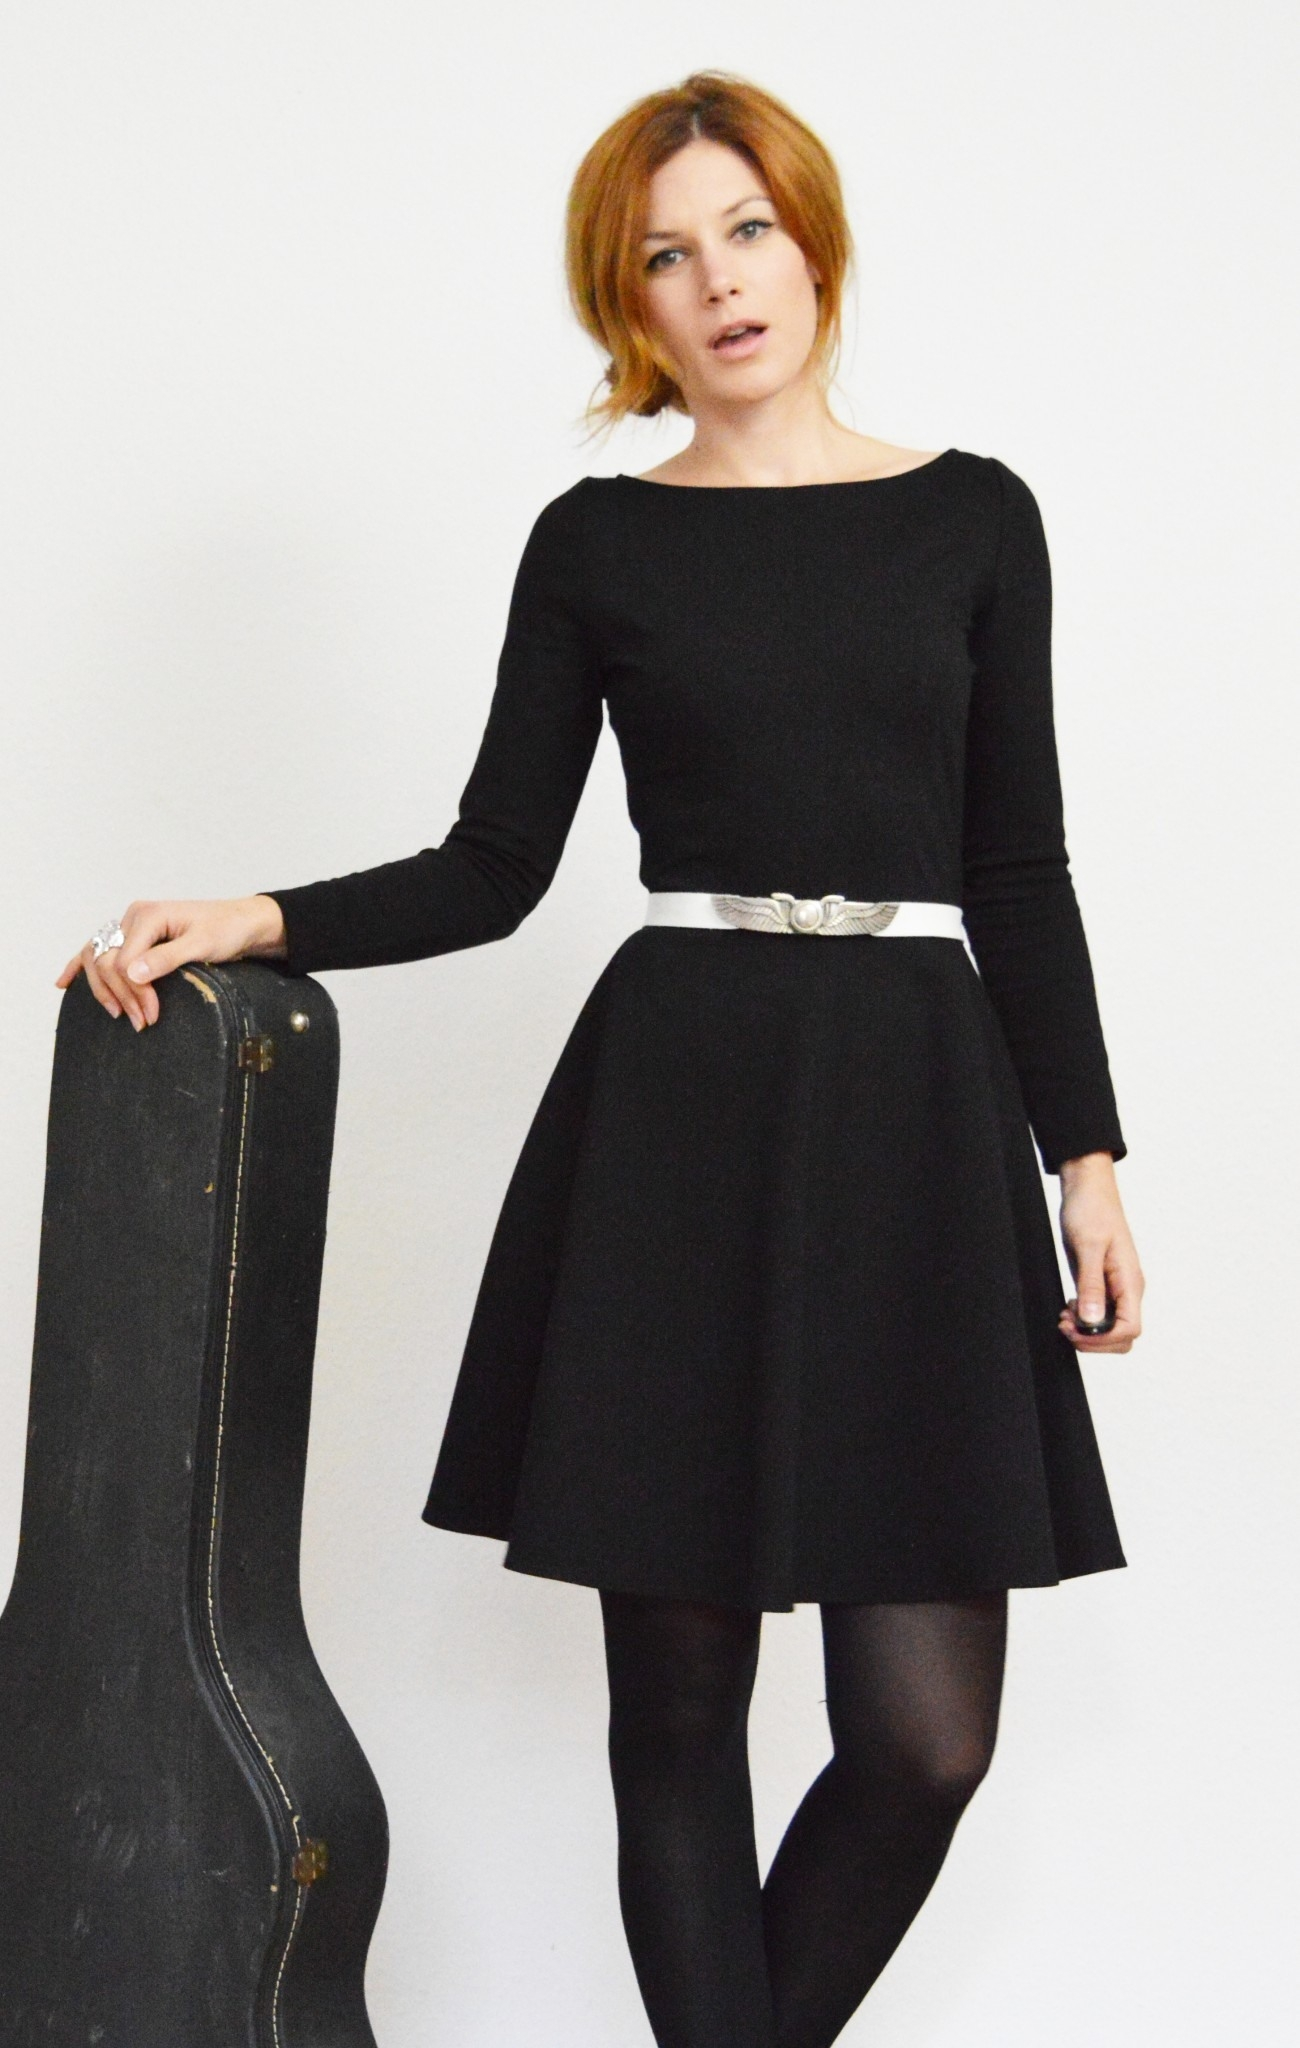 Abend Top Kleid Mit Glockenrock Ärmel Luxurius Kleid Mit Glockenrock Bester Preis